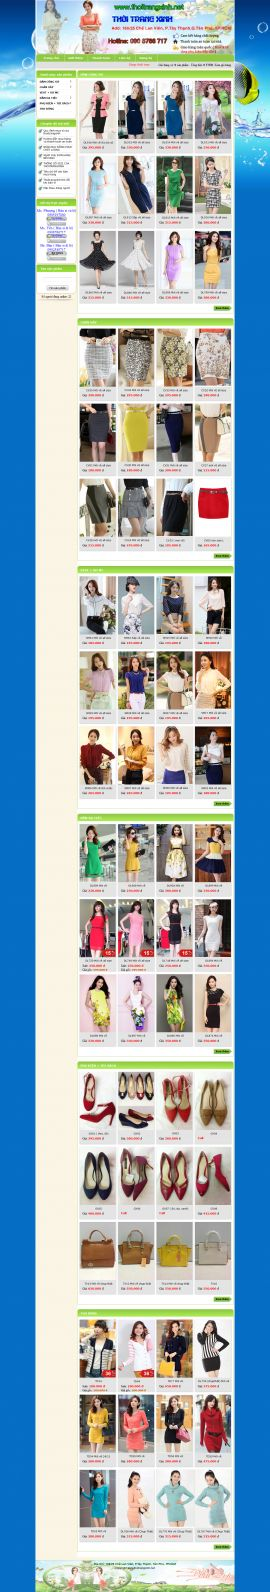 Mẫu website thời trang 10345